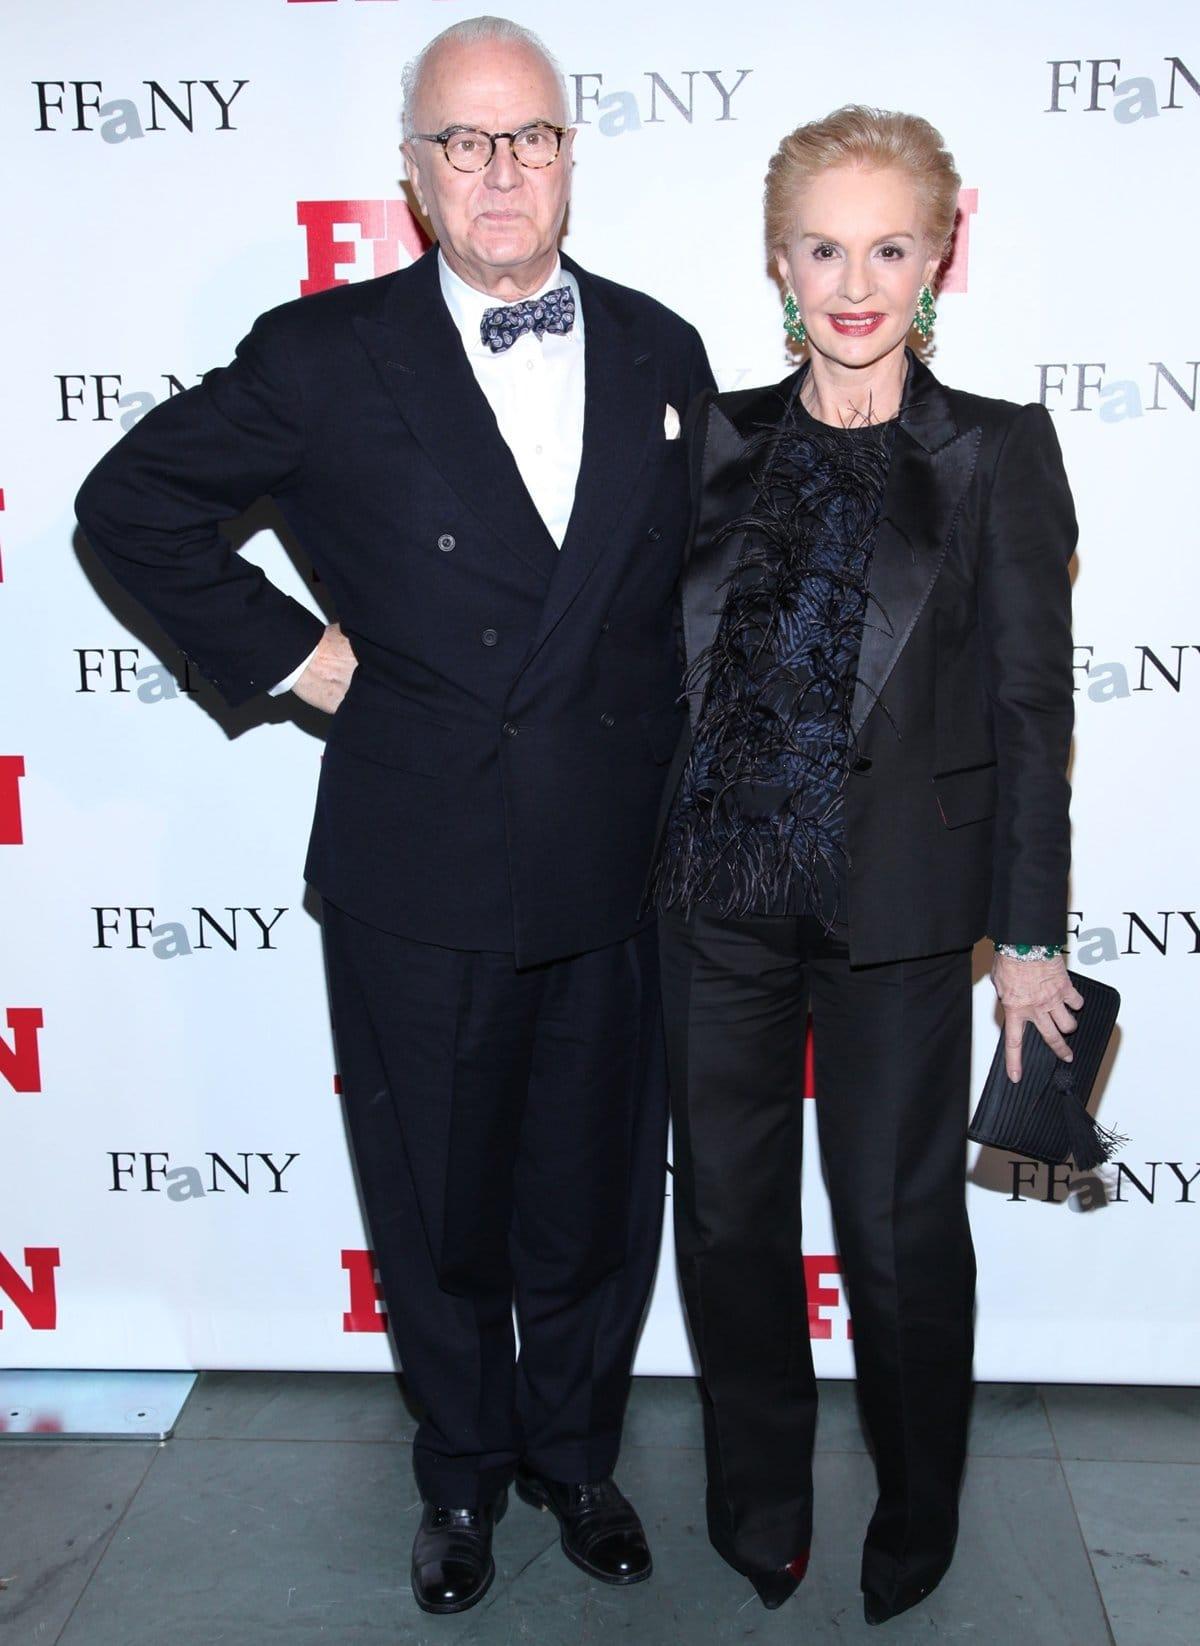 Shoe designer Manolo Blahnik (L) and designer Carolina Herrera attend the 25th Annual Footwear News Achievement Awards at the Museum of Modern Art on November 29, 2011, in New York City